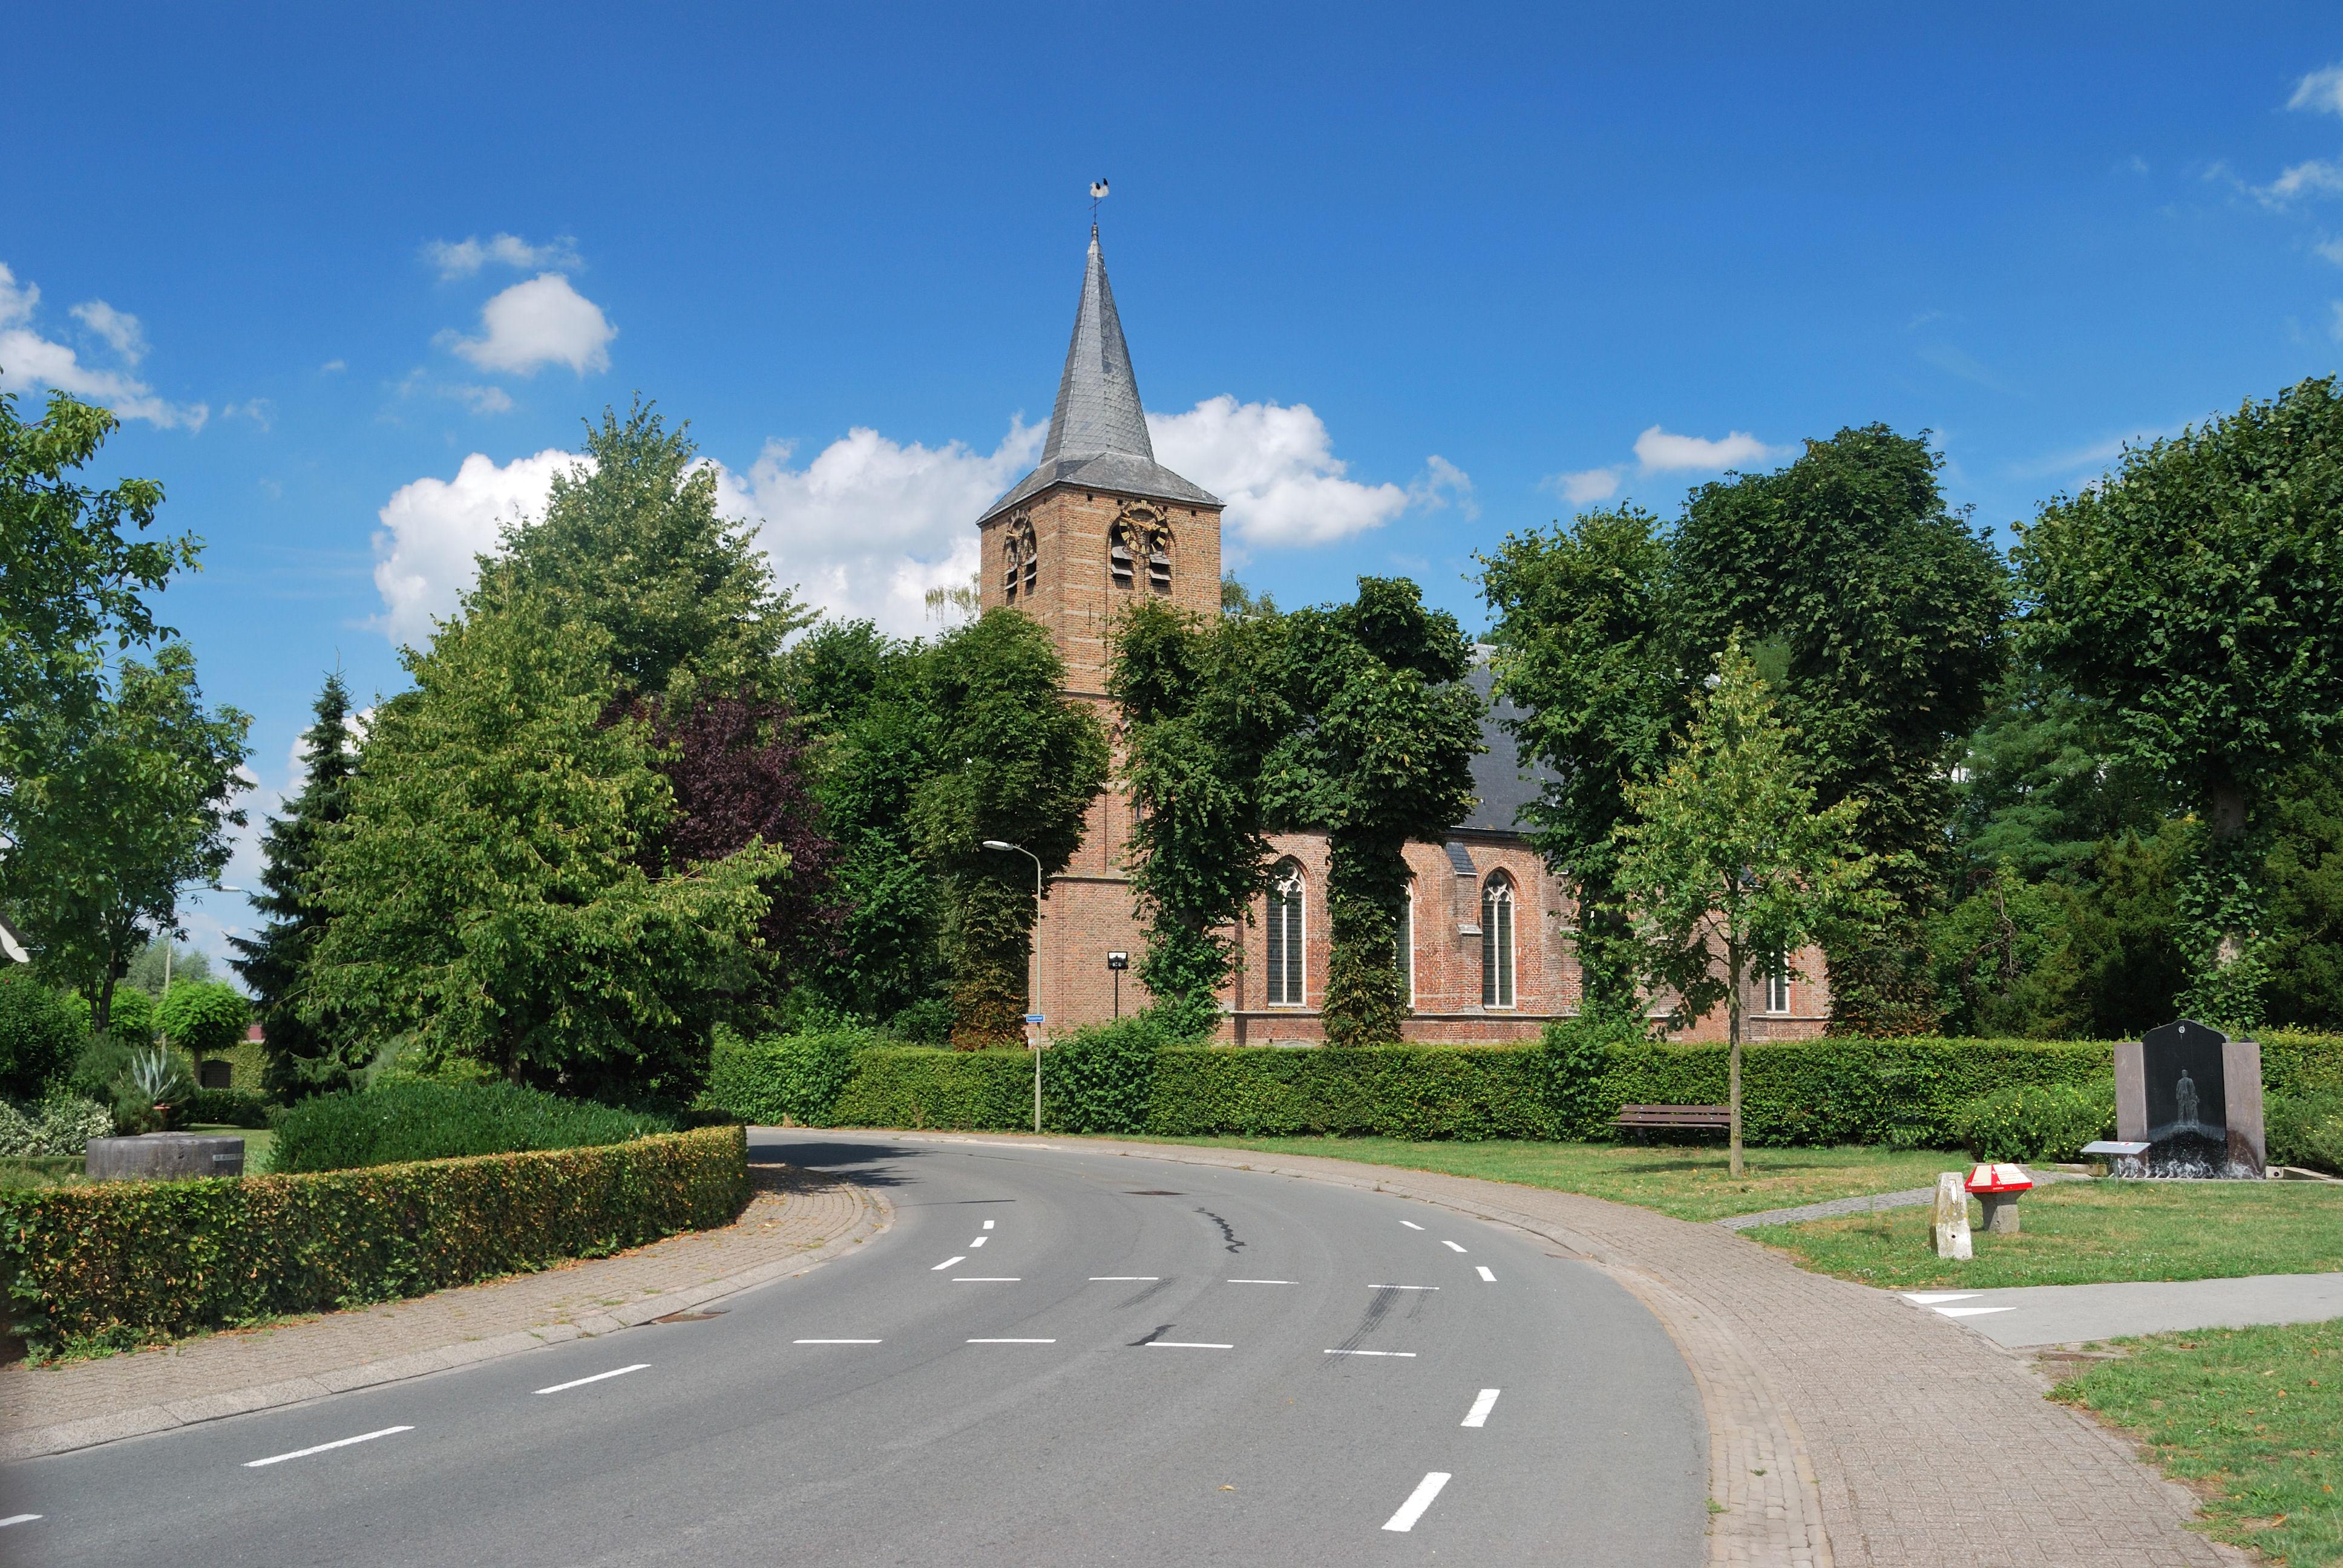 Afbeeldingsresultaat voor Ludgerus Kerk te Hall